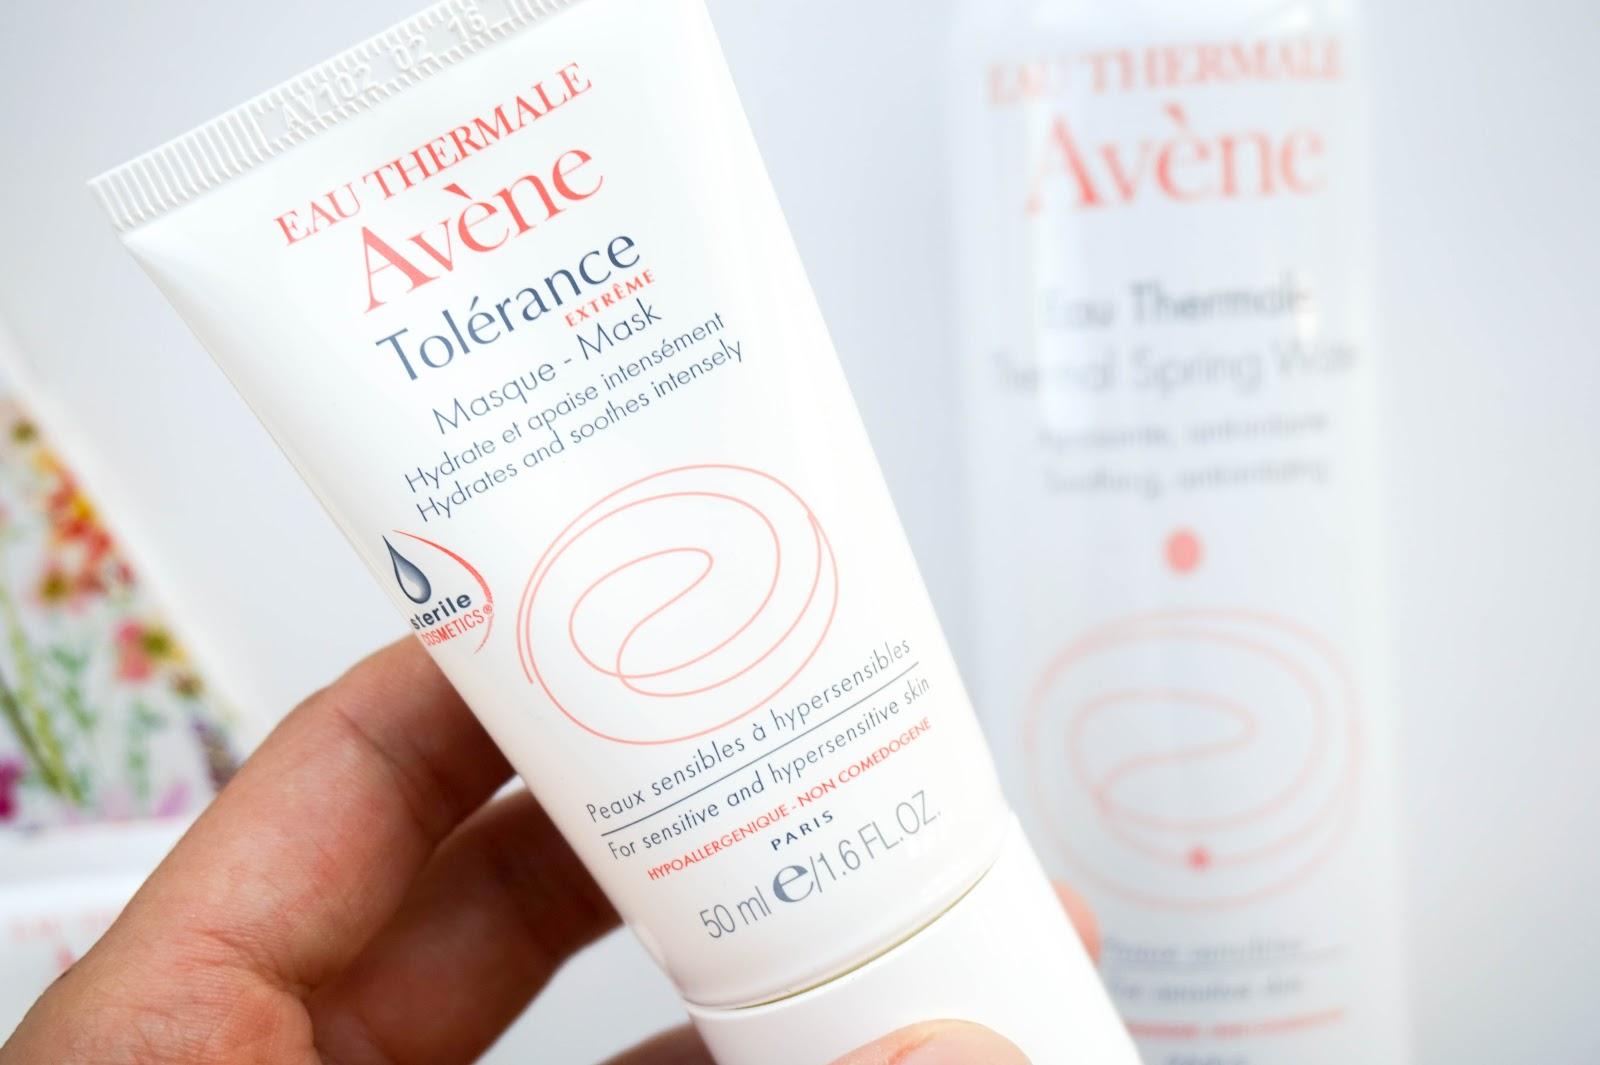 #KeepItSimple with Avène Tolérance EXTRÊME